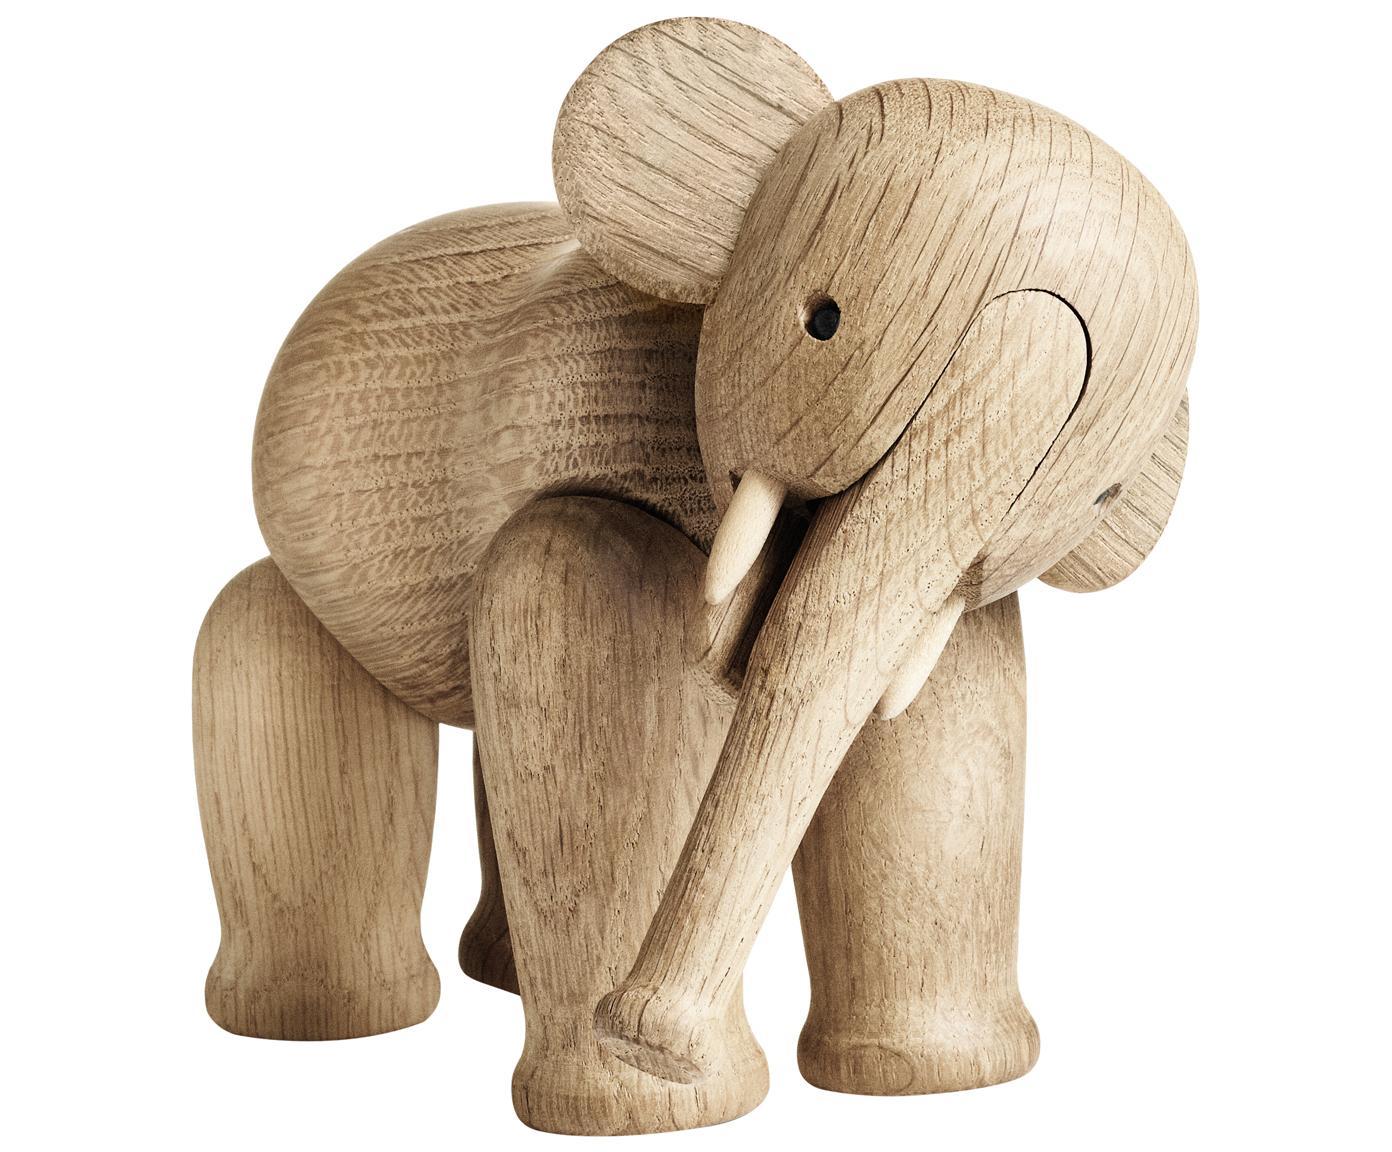 Designer-Deko-Objekt Elephant, Eichenholz, Eichenholz, lackiert, Eichenholz, 17 x 13 cm